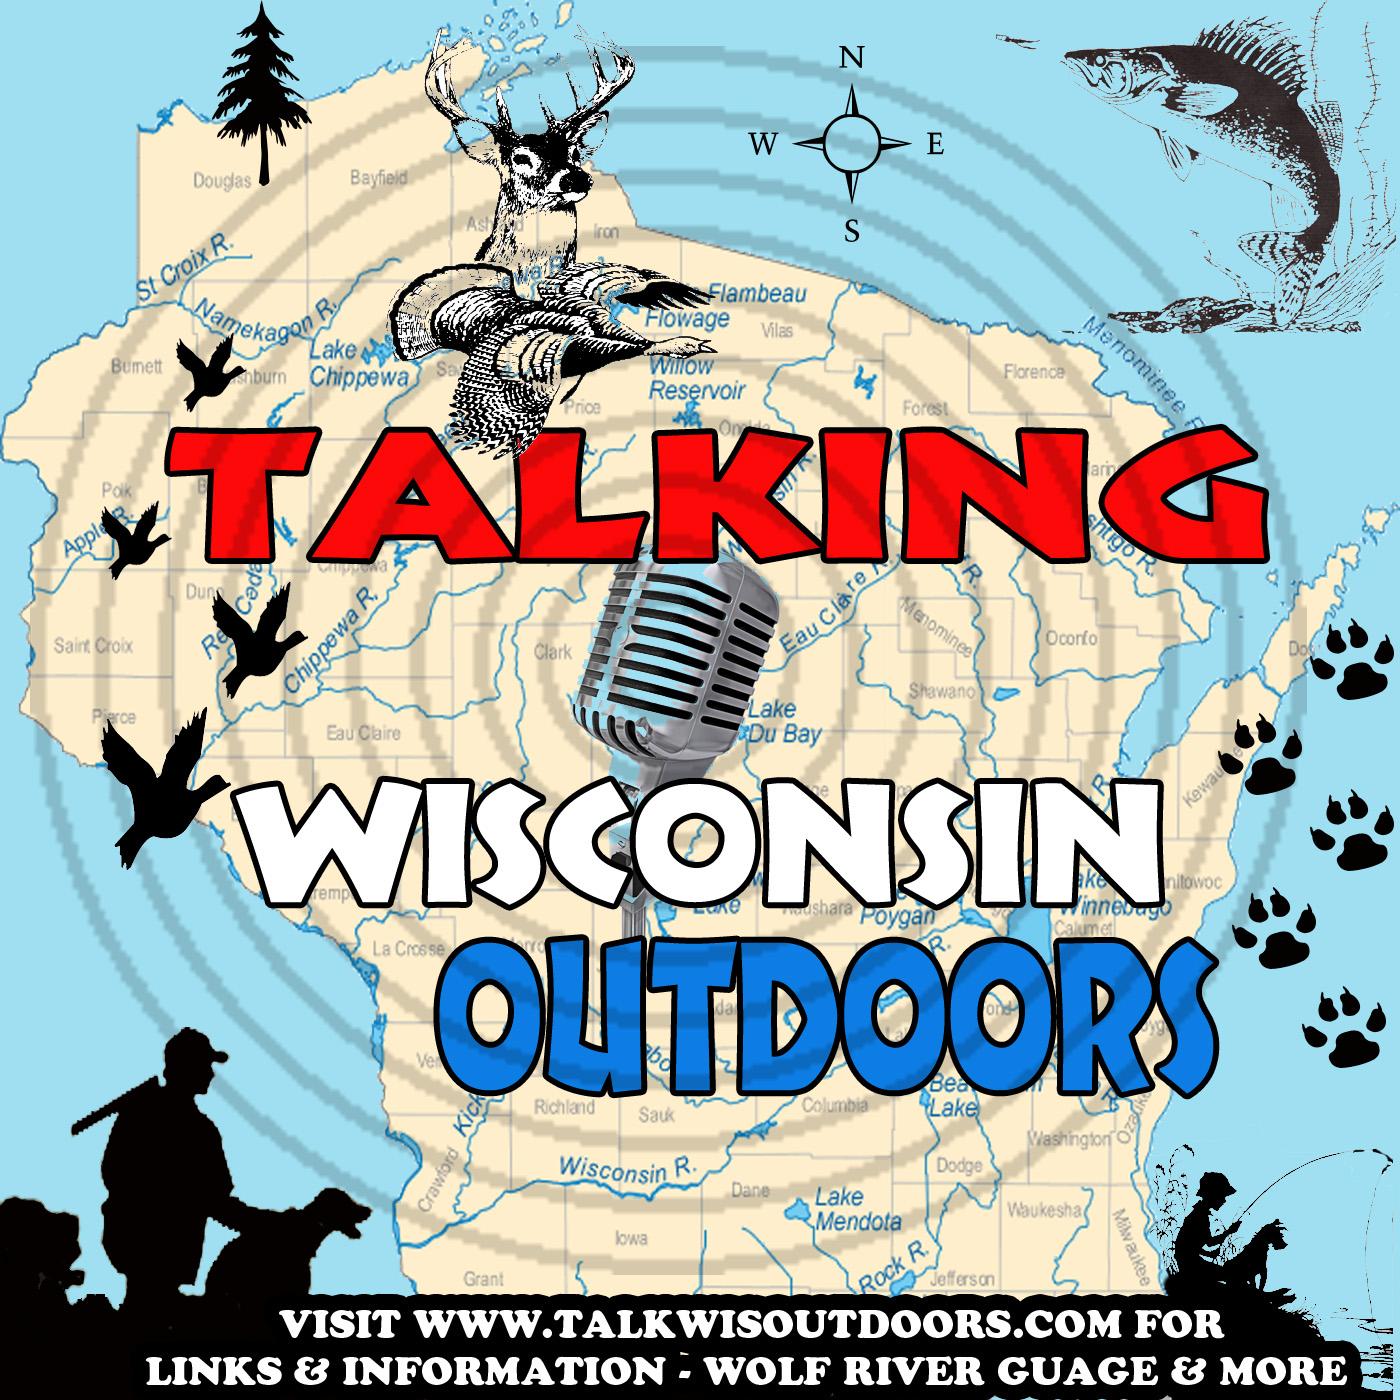 Talking Wisconsin Outdoors